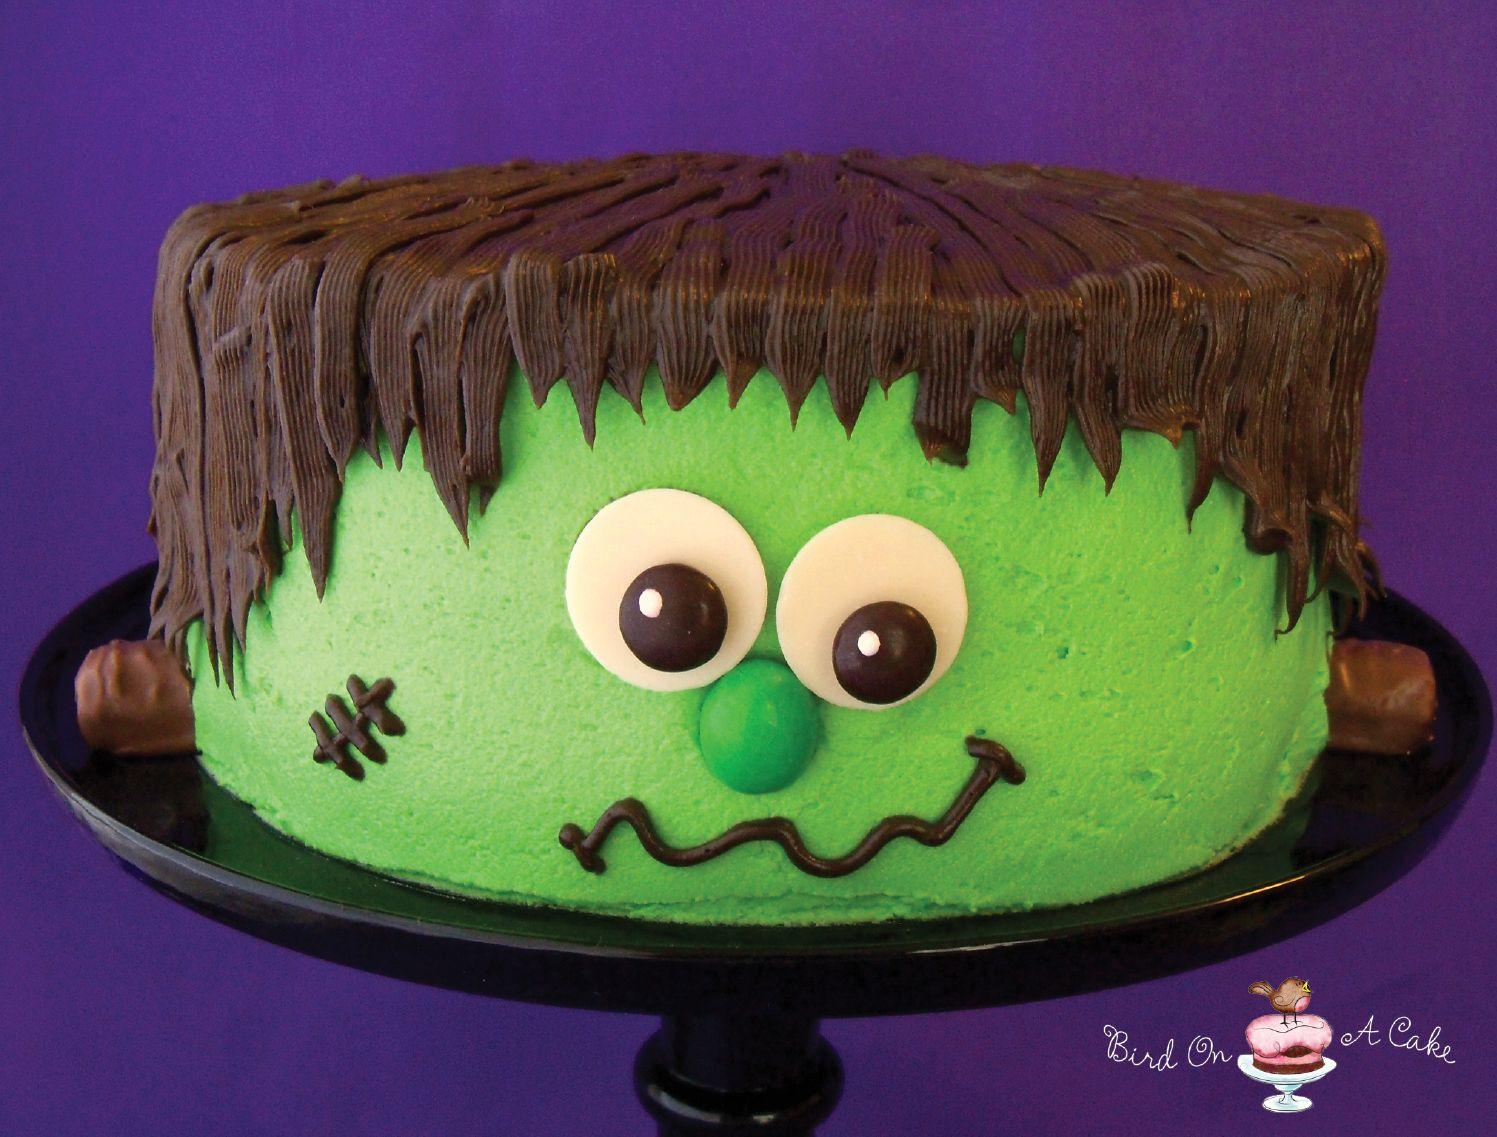 Bird On A Cake Frankensteins Monster Cake holiday ideas